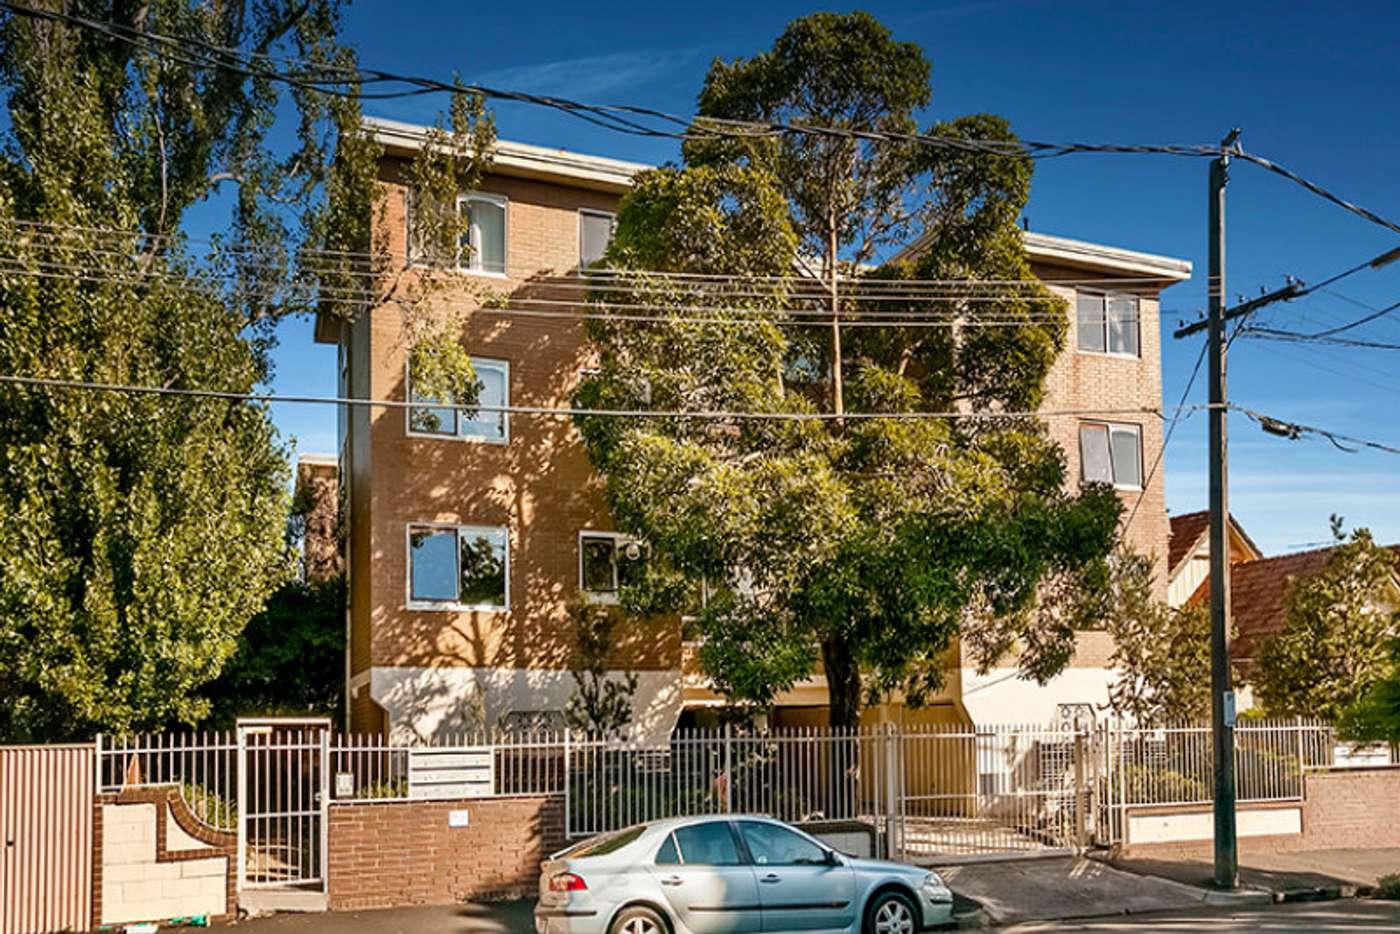 Main view of Homely apartment listing, 17/31 Burnett Street, St Kilda VIC 3182